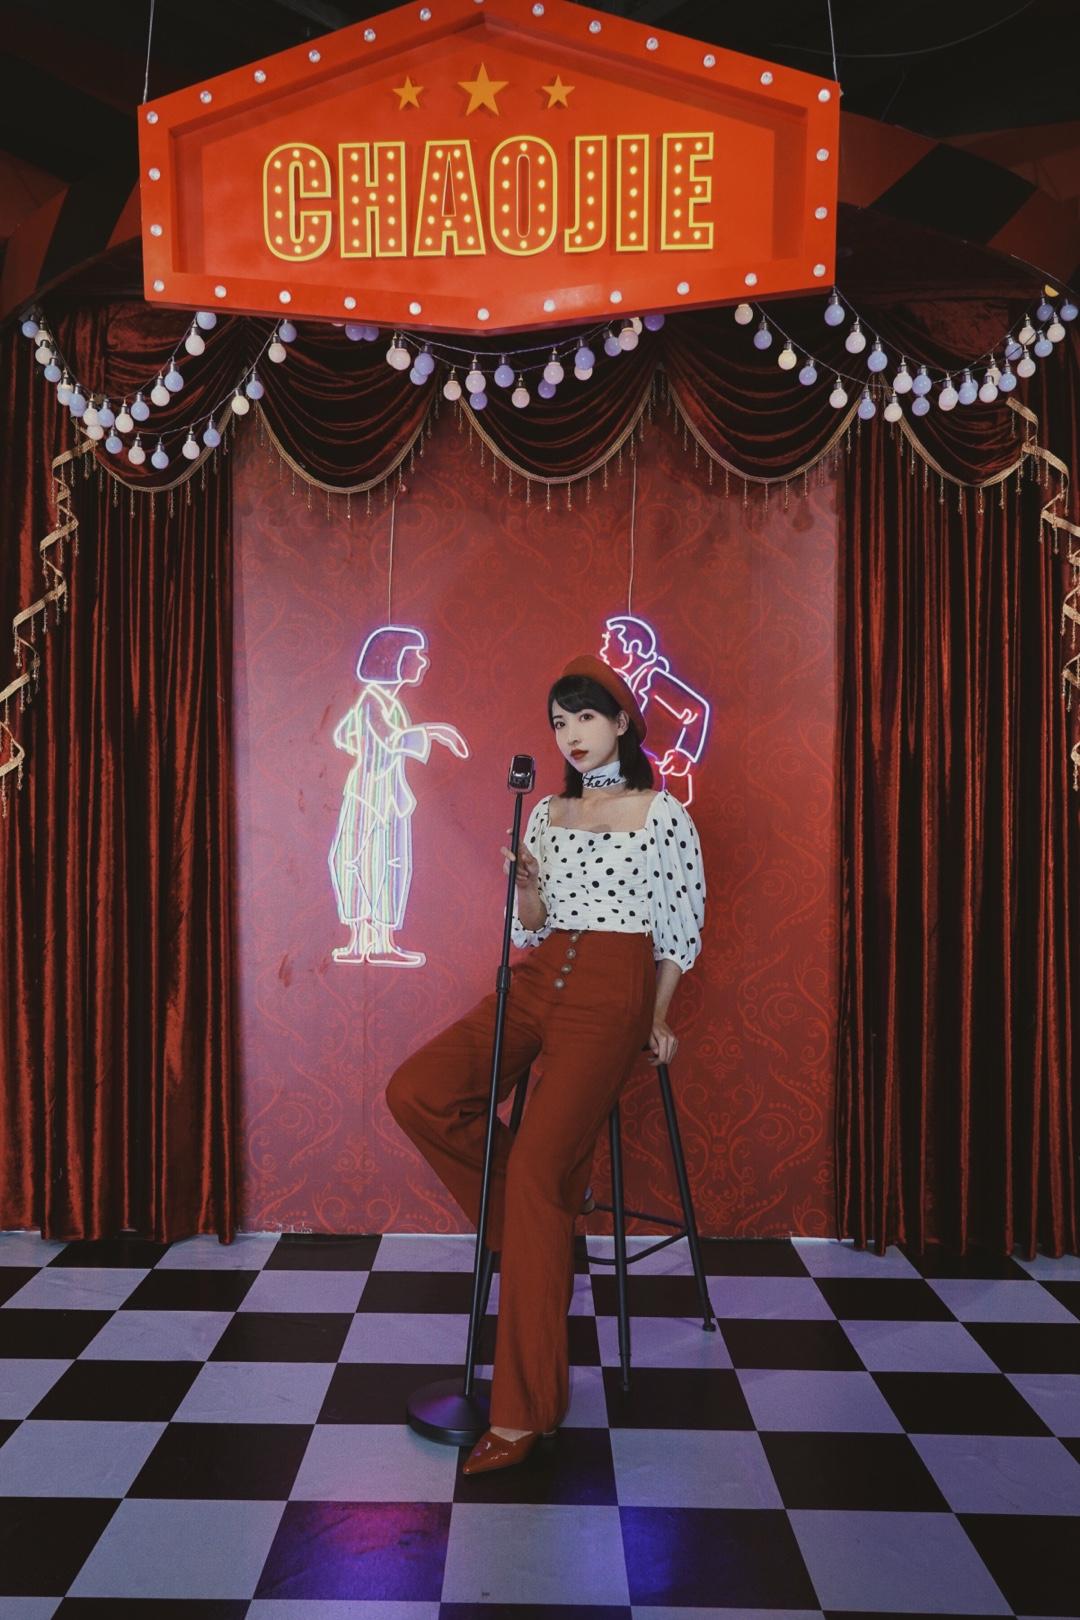 【Valerie's OOTD】Vol.228 一直以来都超爱复古风,尤其是在复古场景里,这种穿搭更是最合适的。 我这套穿搭上衣是波点短上衣,泡泡袖设计增添了几分甜美,腰身的褶皱设计很特别还很修身。下装搭配了一条酒红色高腰阔腿裤,这个颜色和波点超搭,高腰和短上衣更是显得身材比例超好。 再搭配一条字母丝巾以及一个橘色贝雷帽,一个复古女孩就诞生啦。 #全网女孩都爱复古甜美风?#